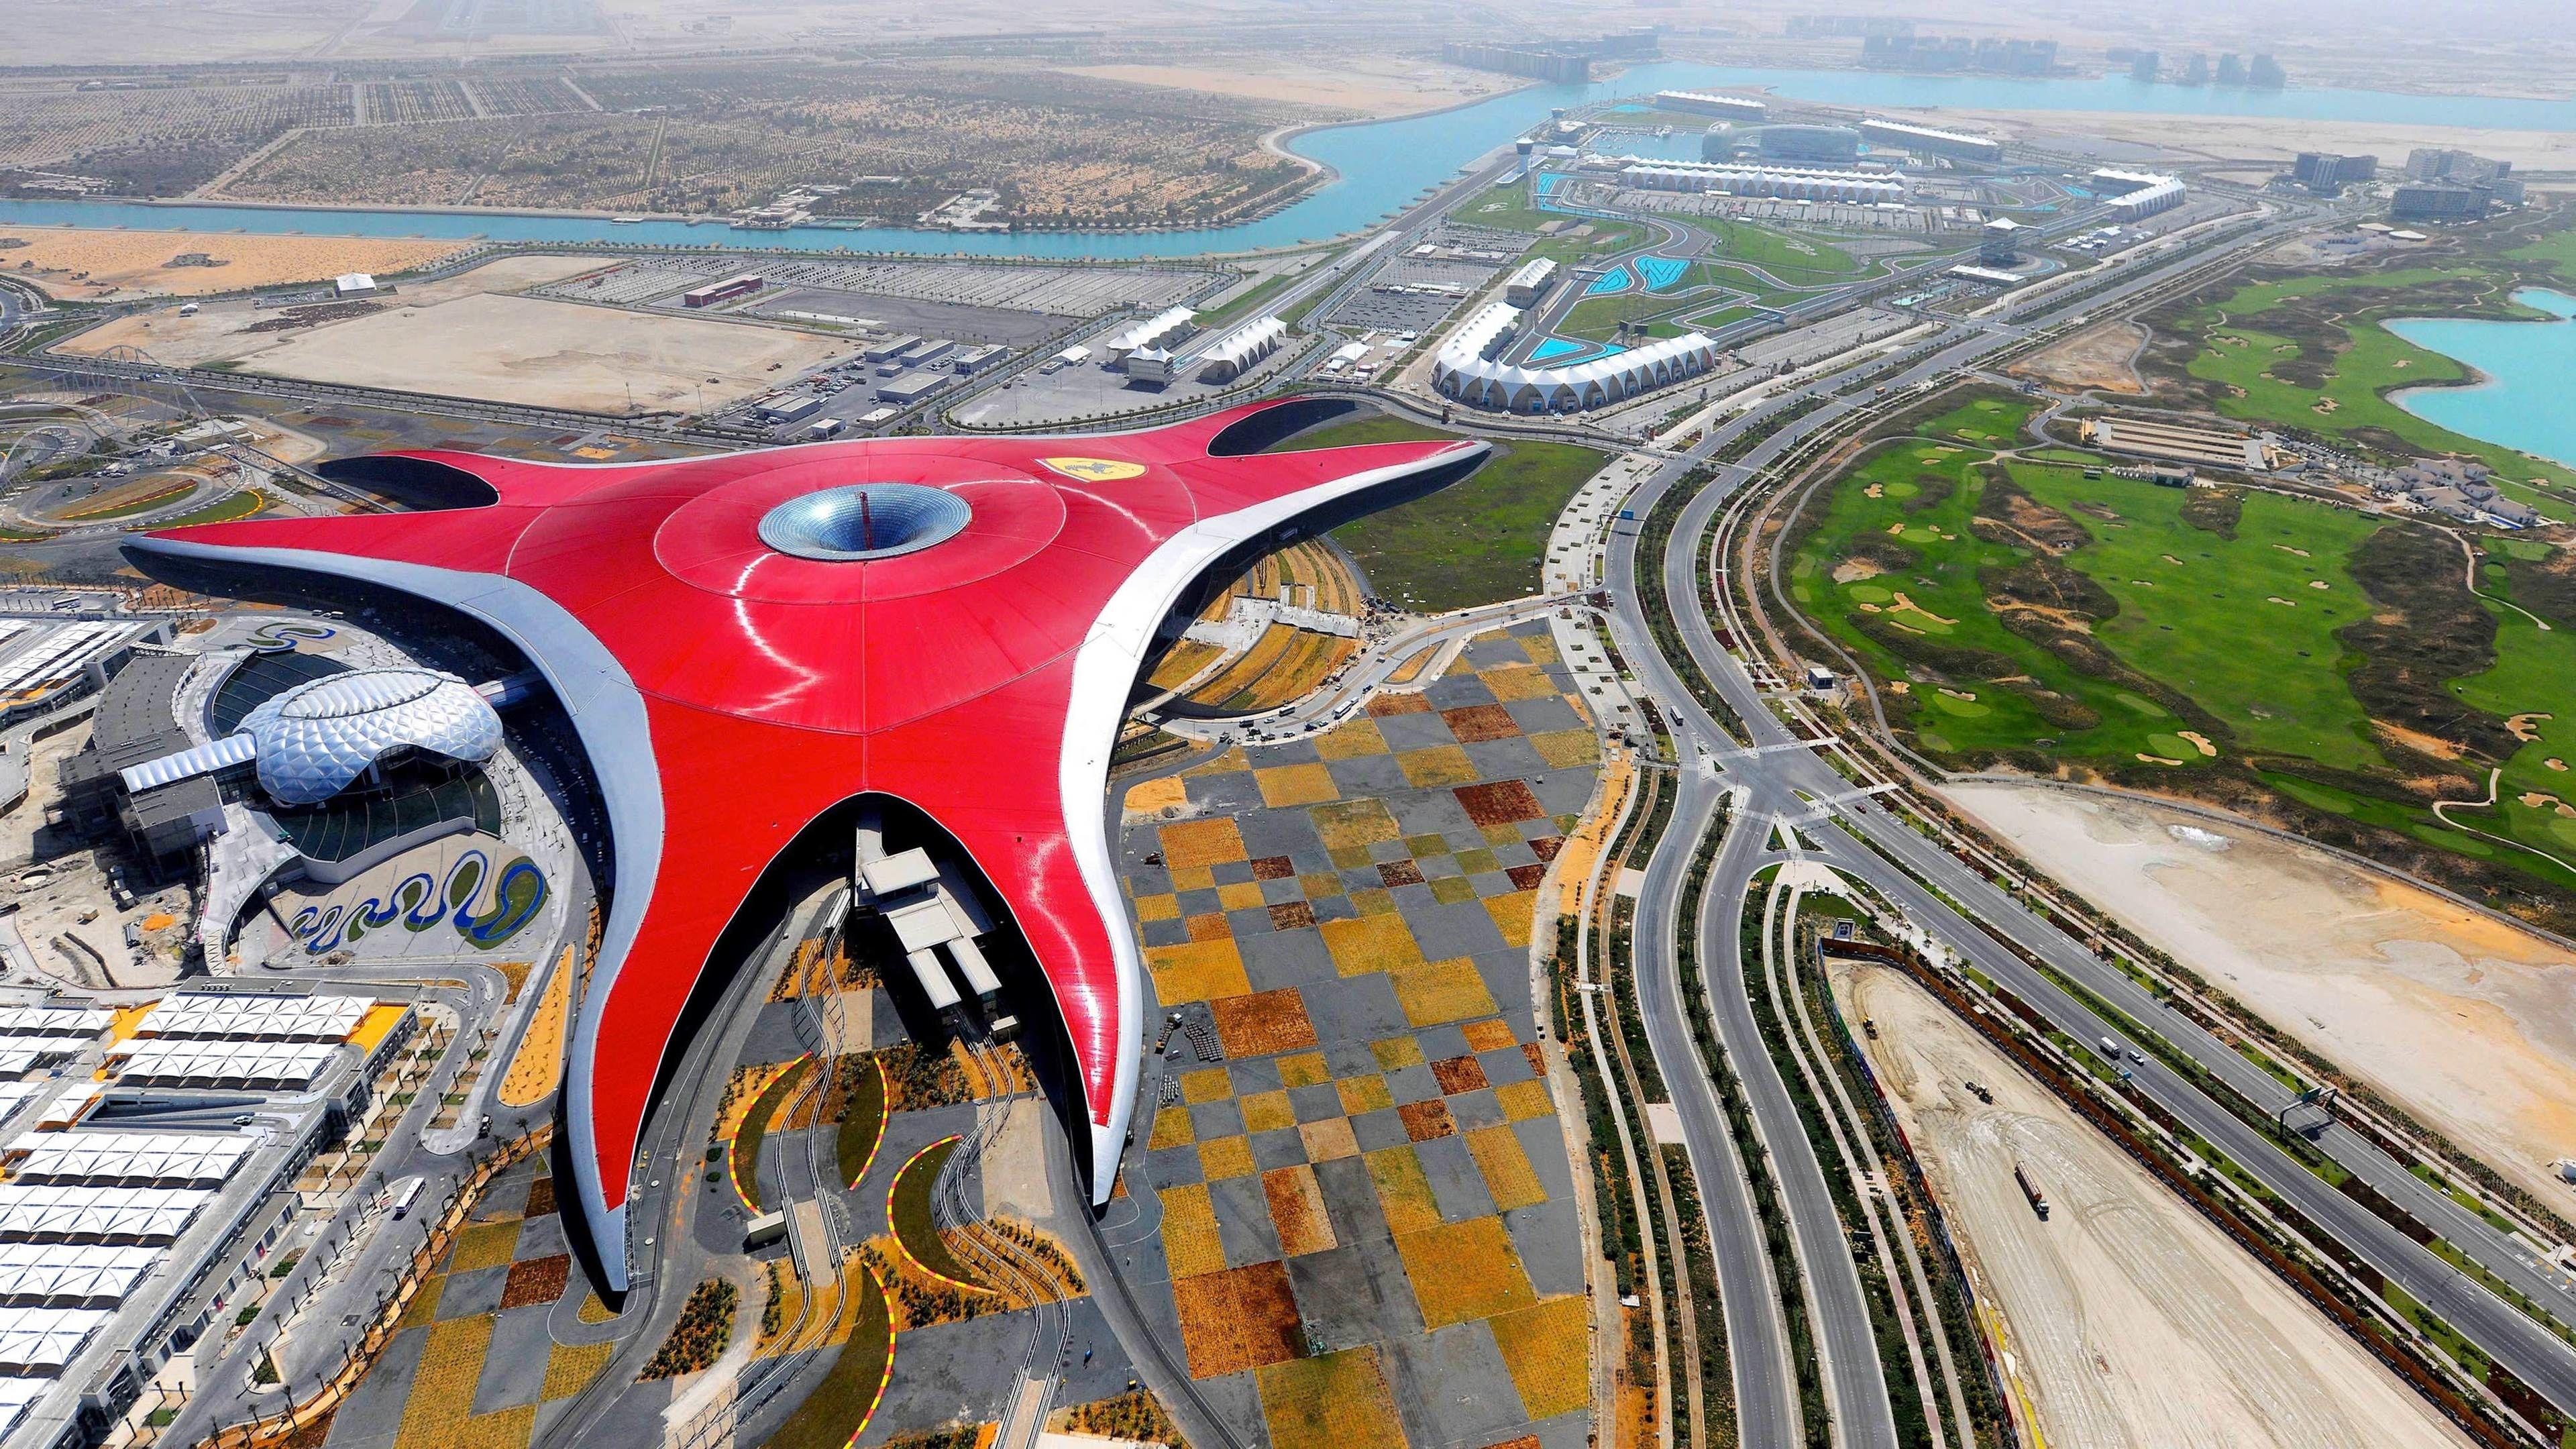 ariel view of Ferrari world park in Dubai